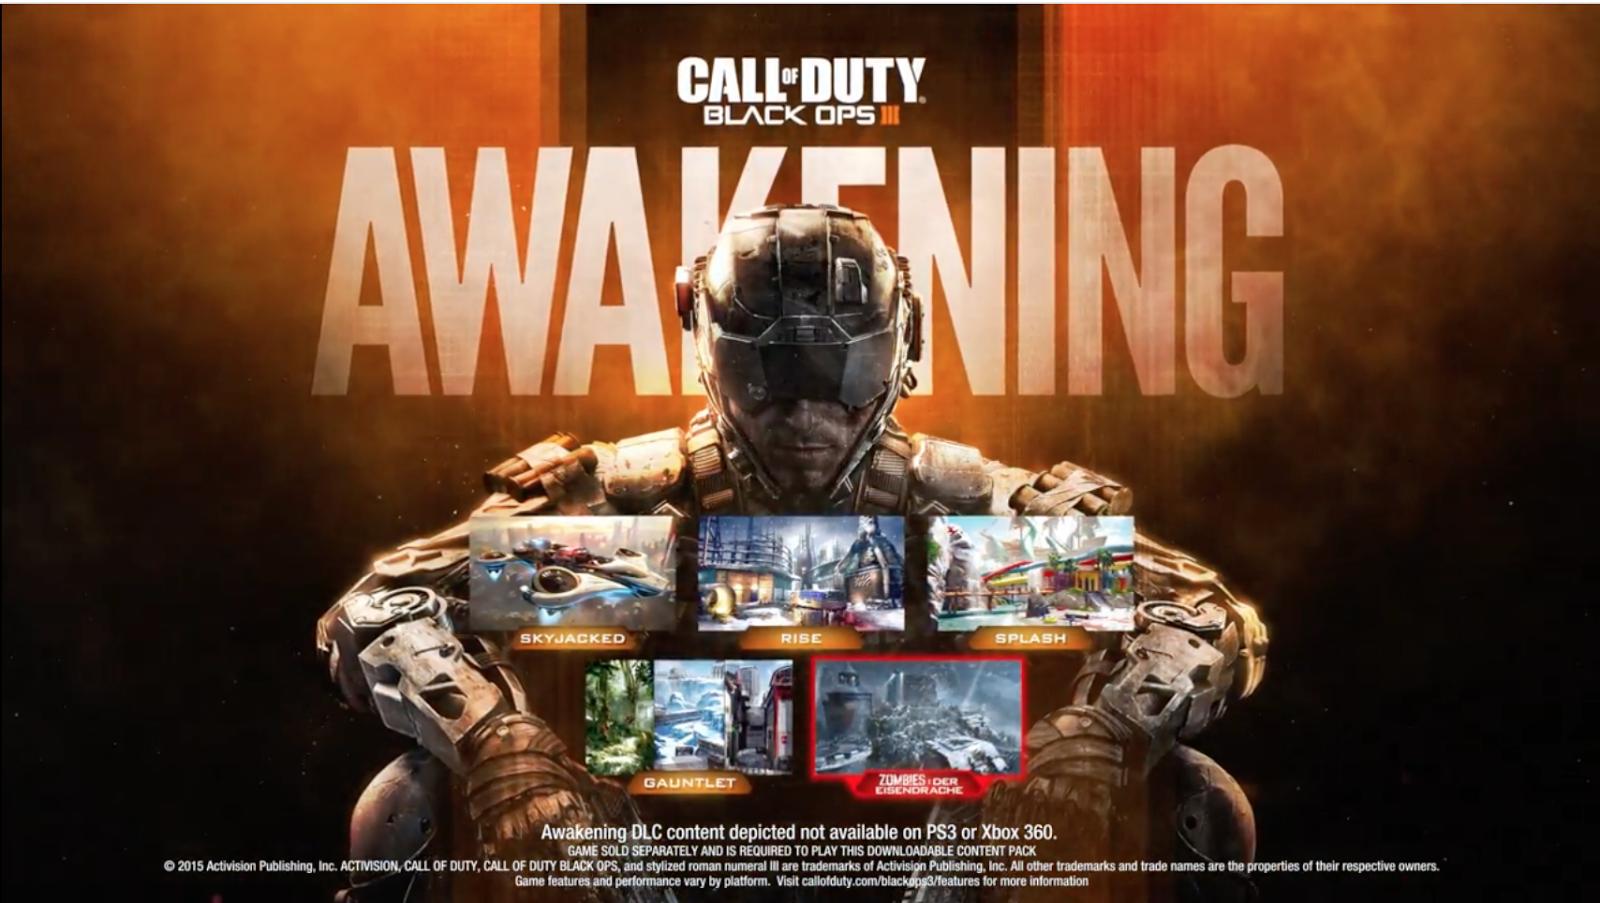 Call of Duty: Black Ops III - Awakening (Video Game Review ... Call Of Duty Black Ops Zombies All Maps on